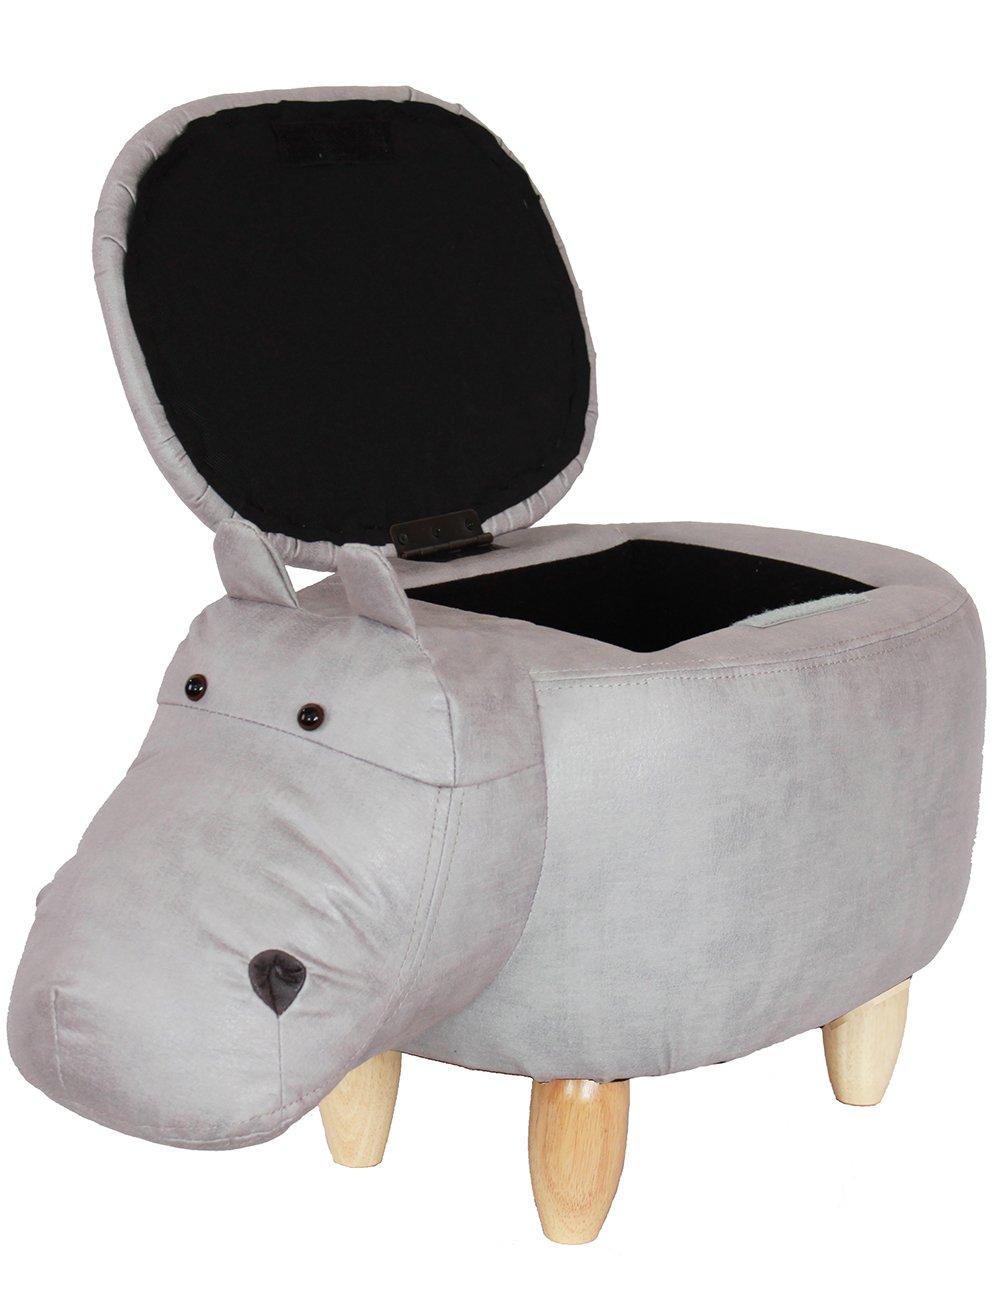 HAOSOON Animal ottoman Series Storage Ottoman Footrest Stool with Vivid Adorable Animal-Like Features(Hippo) (grey)